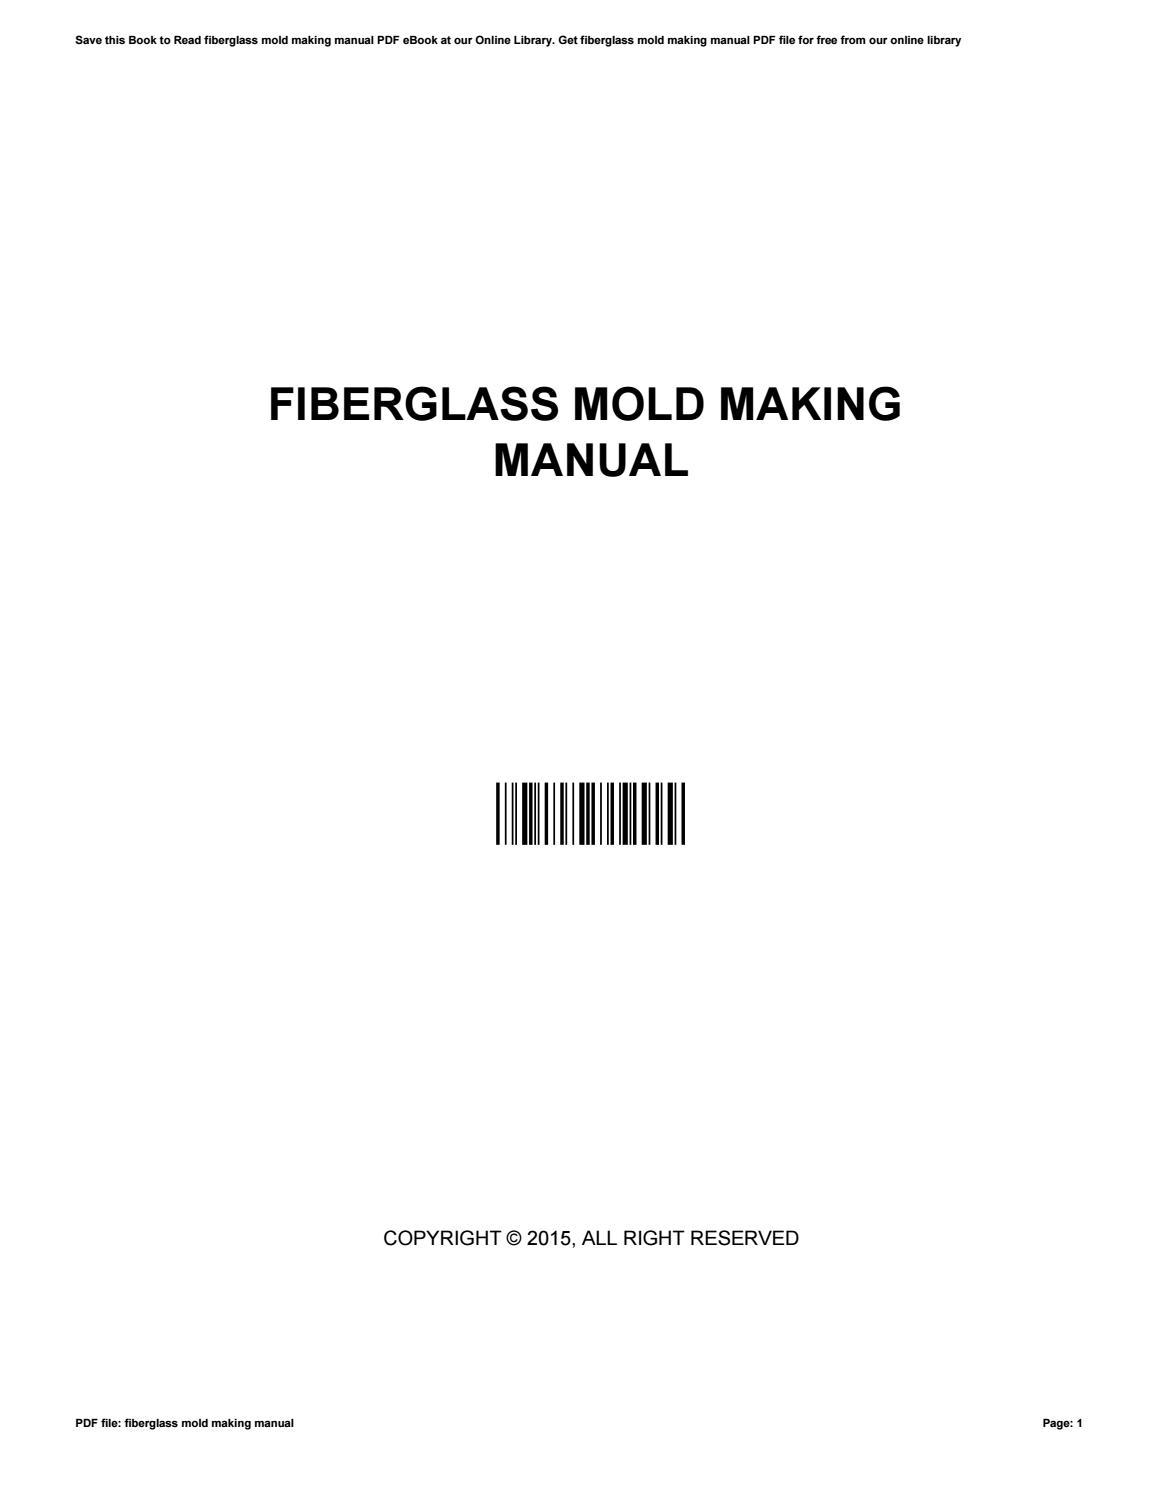 fiberglass mold making manual by alexanderho4786 issuu rh issuu com Foam Fiberglass Mold Making Foam Fiberglass Mold Making